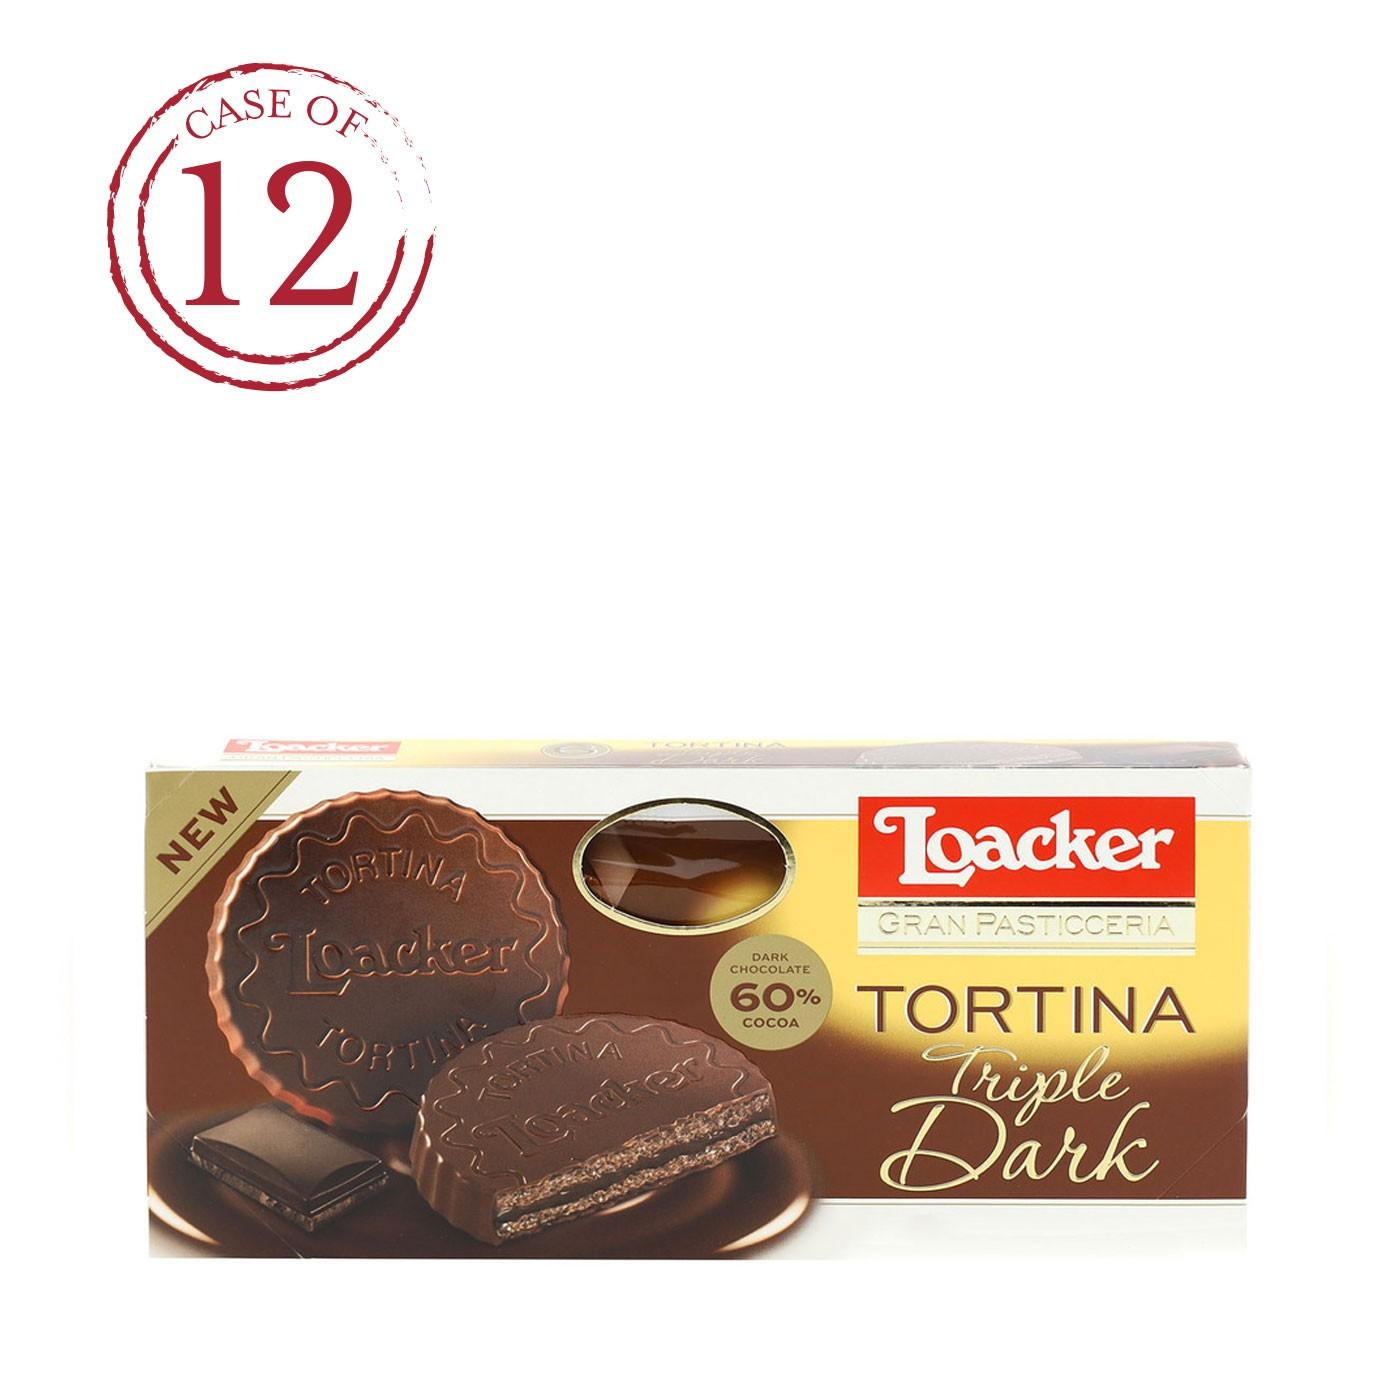 Gran Pasticceria TortinaTriple Dark 4.4 oz - Case of 12